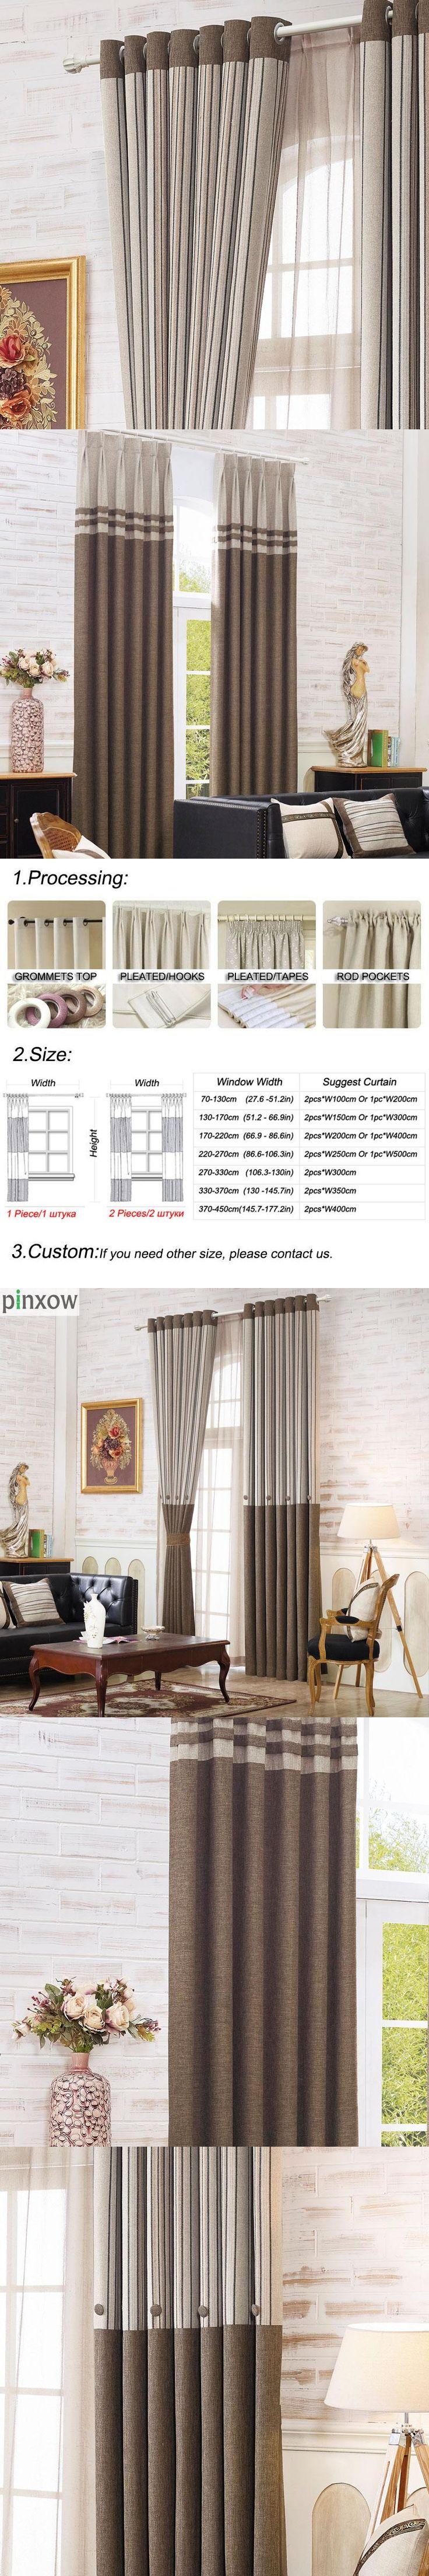 The 25+ best Custom made curtains ideas on Pinterest | Curtains ...